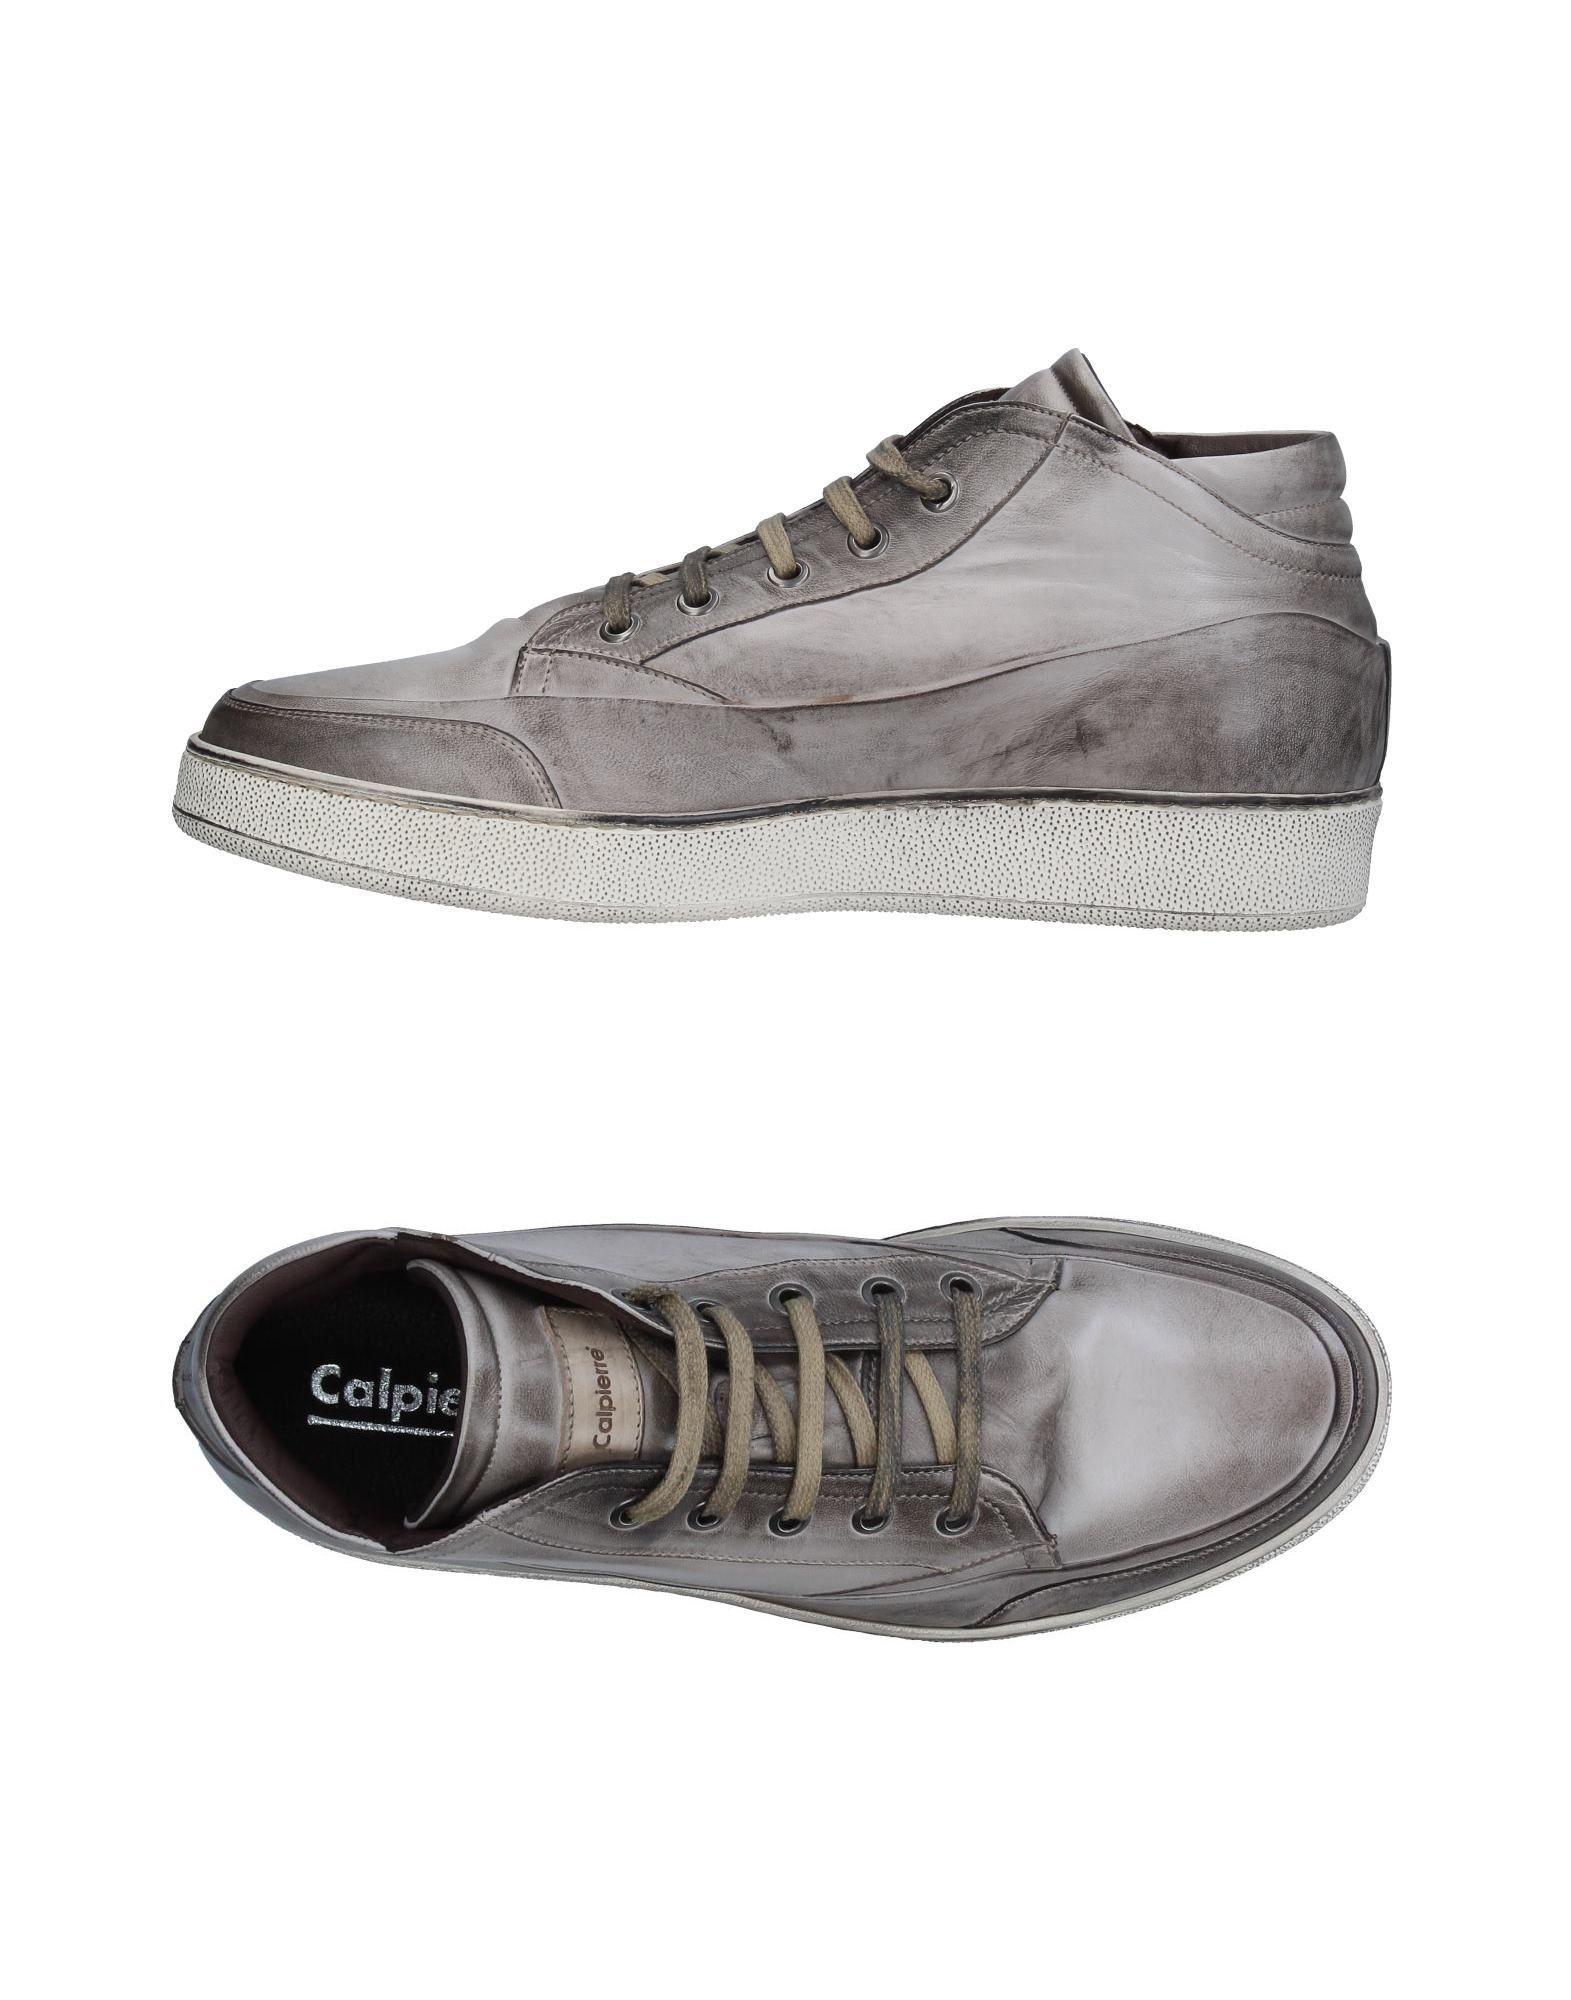 CALPIERRE Высокие кеды и кроссовки кеды кроссовки высокие dc council mid tx stone camo